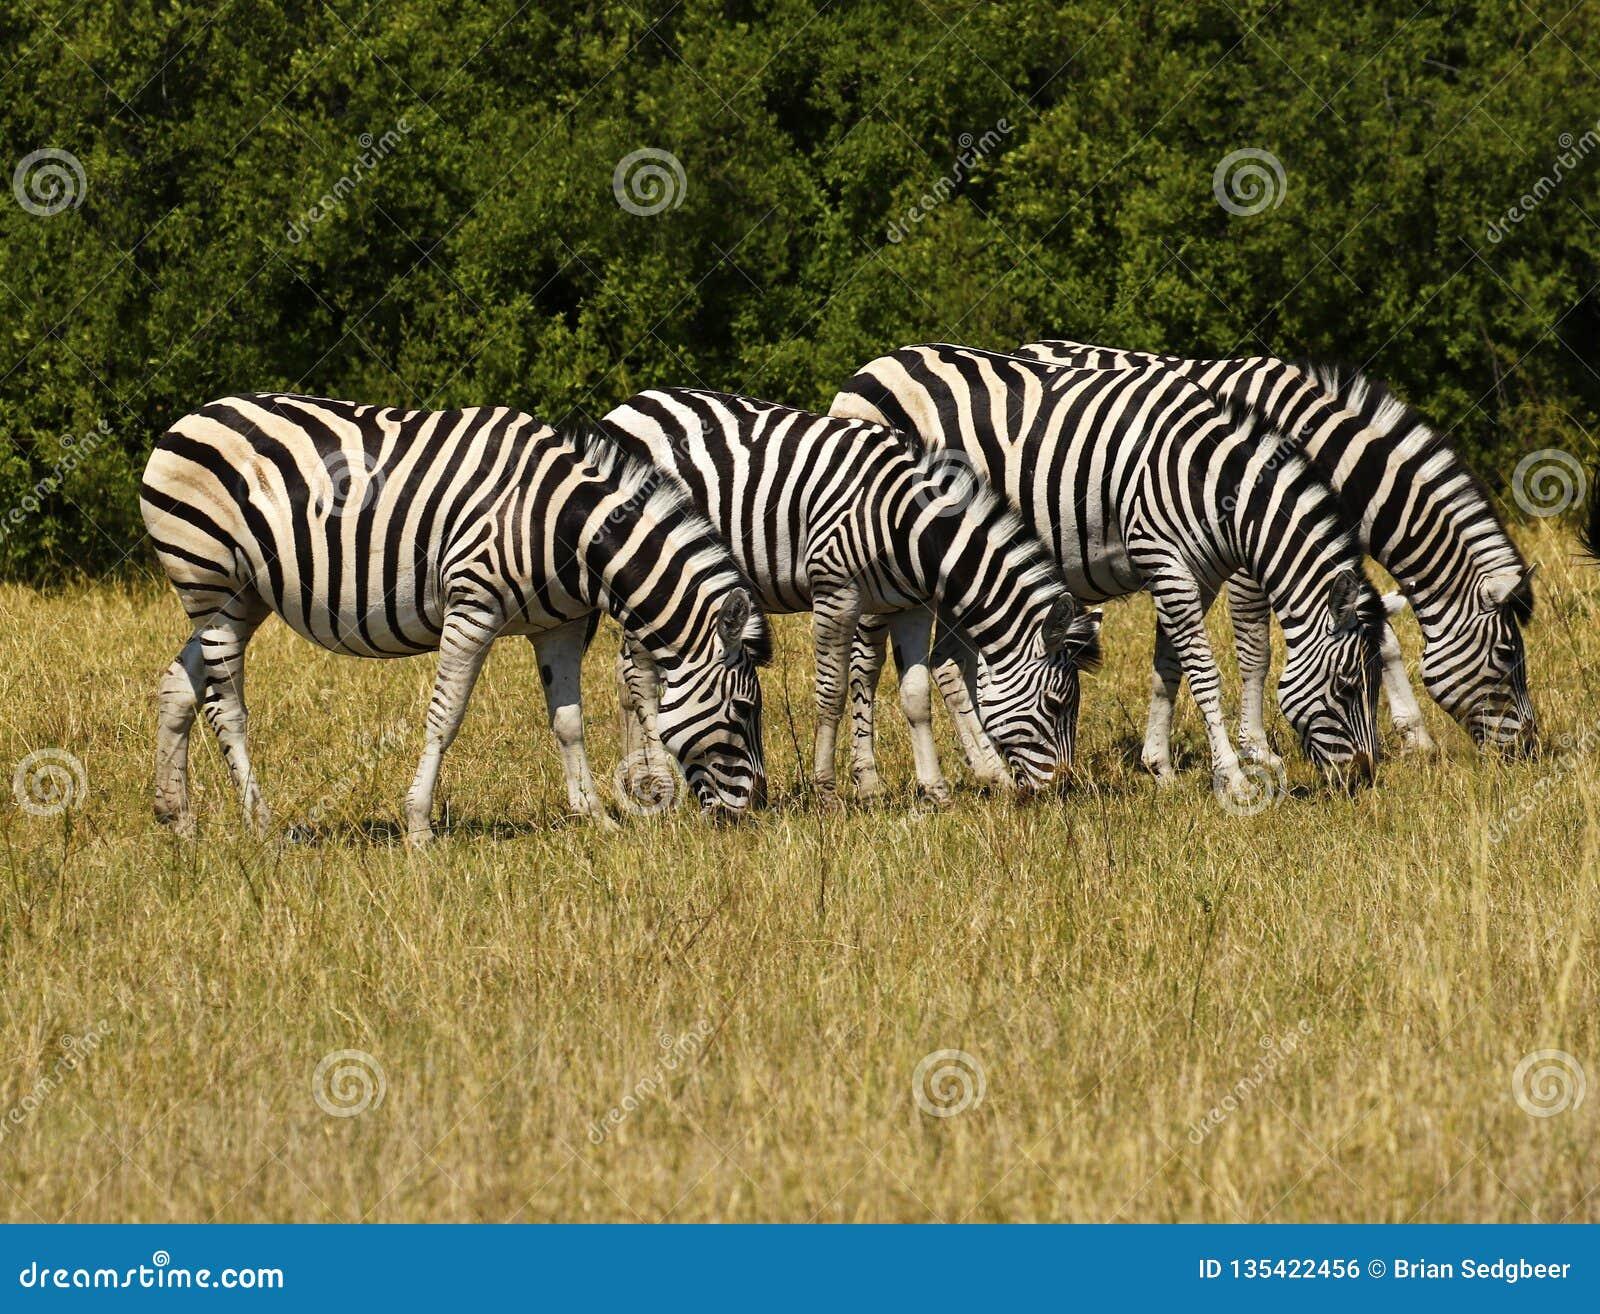 Bella zebra di Burchell e di Waterbucks sulle pianure africane